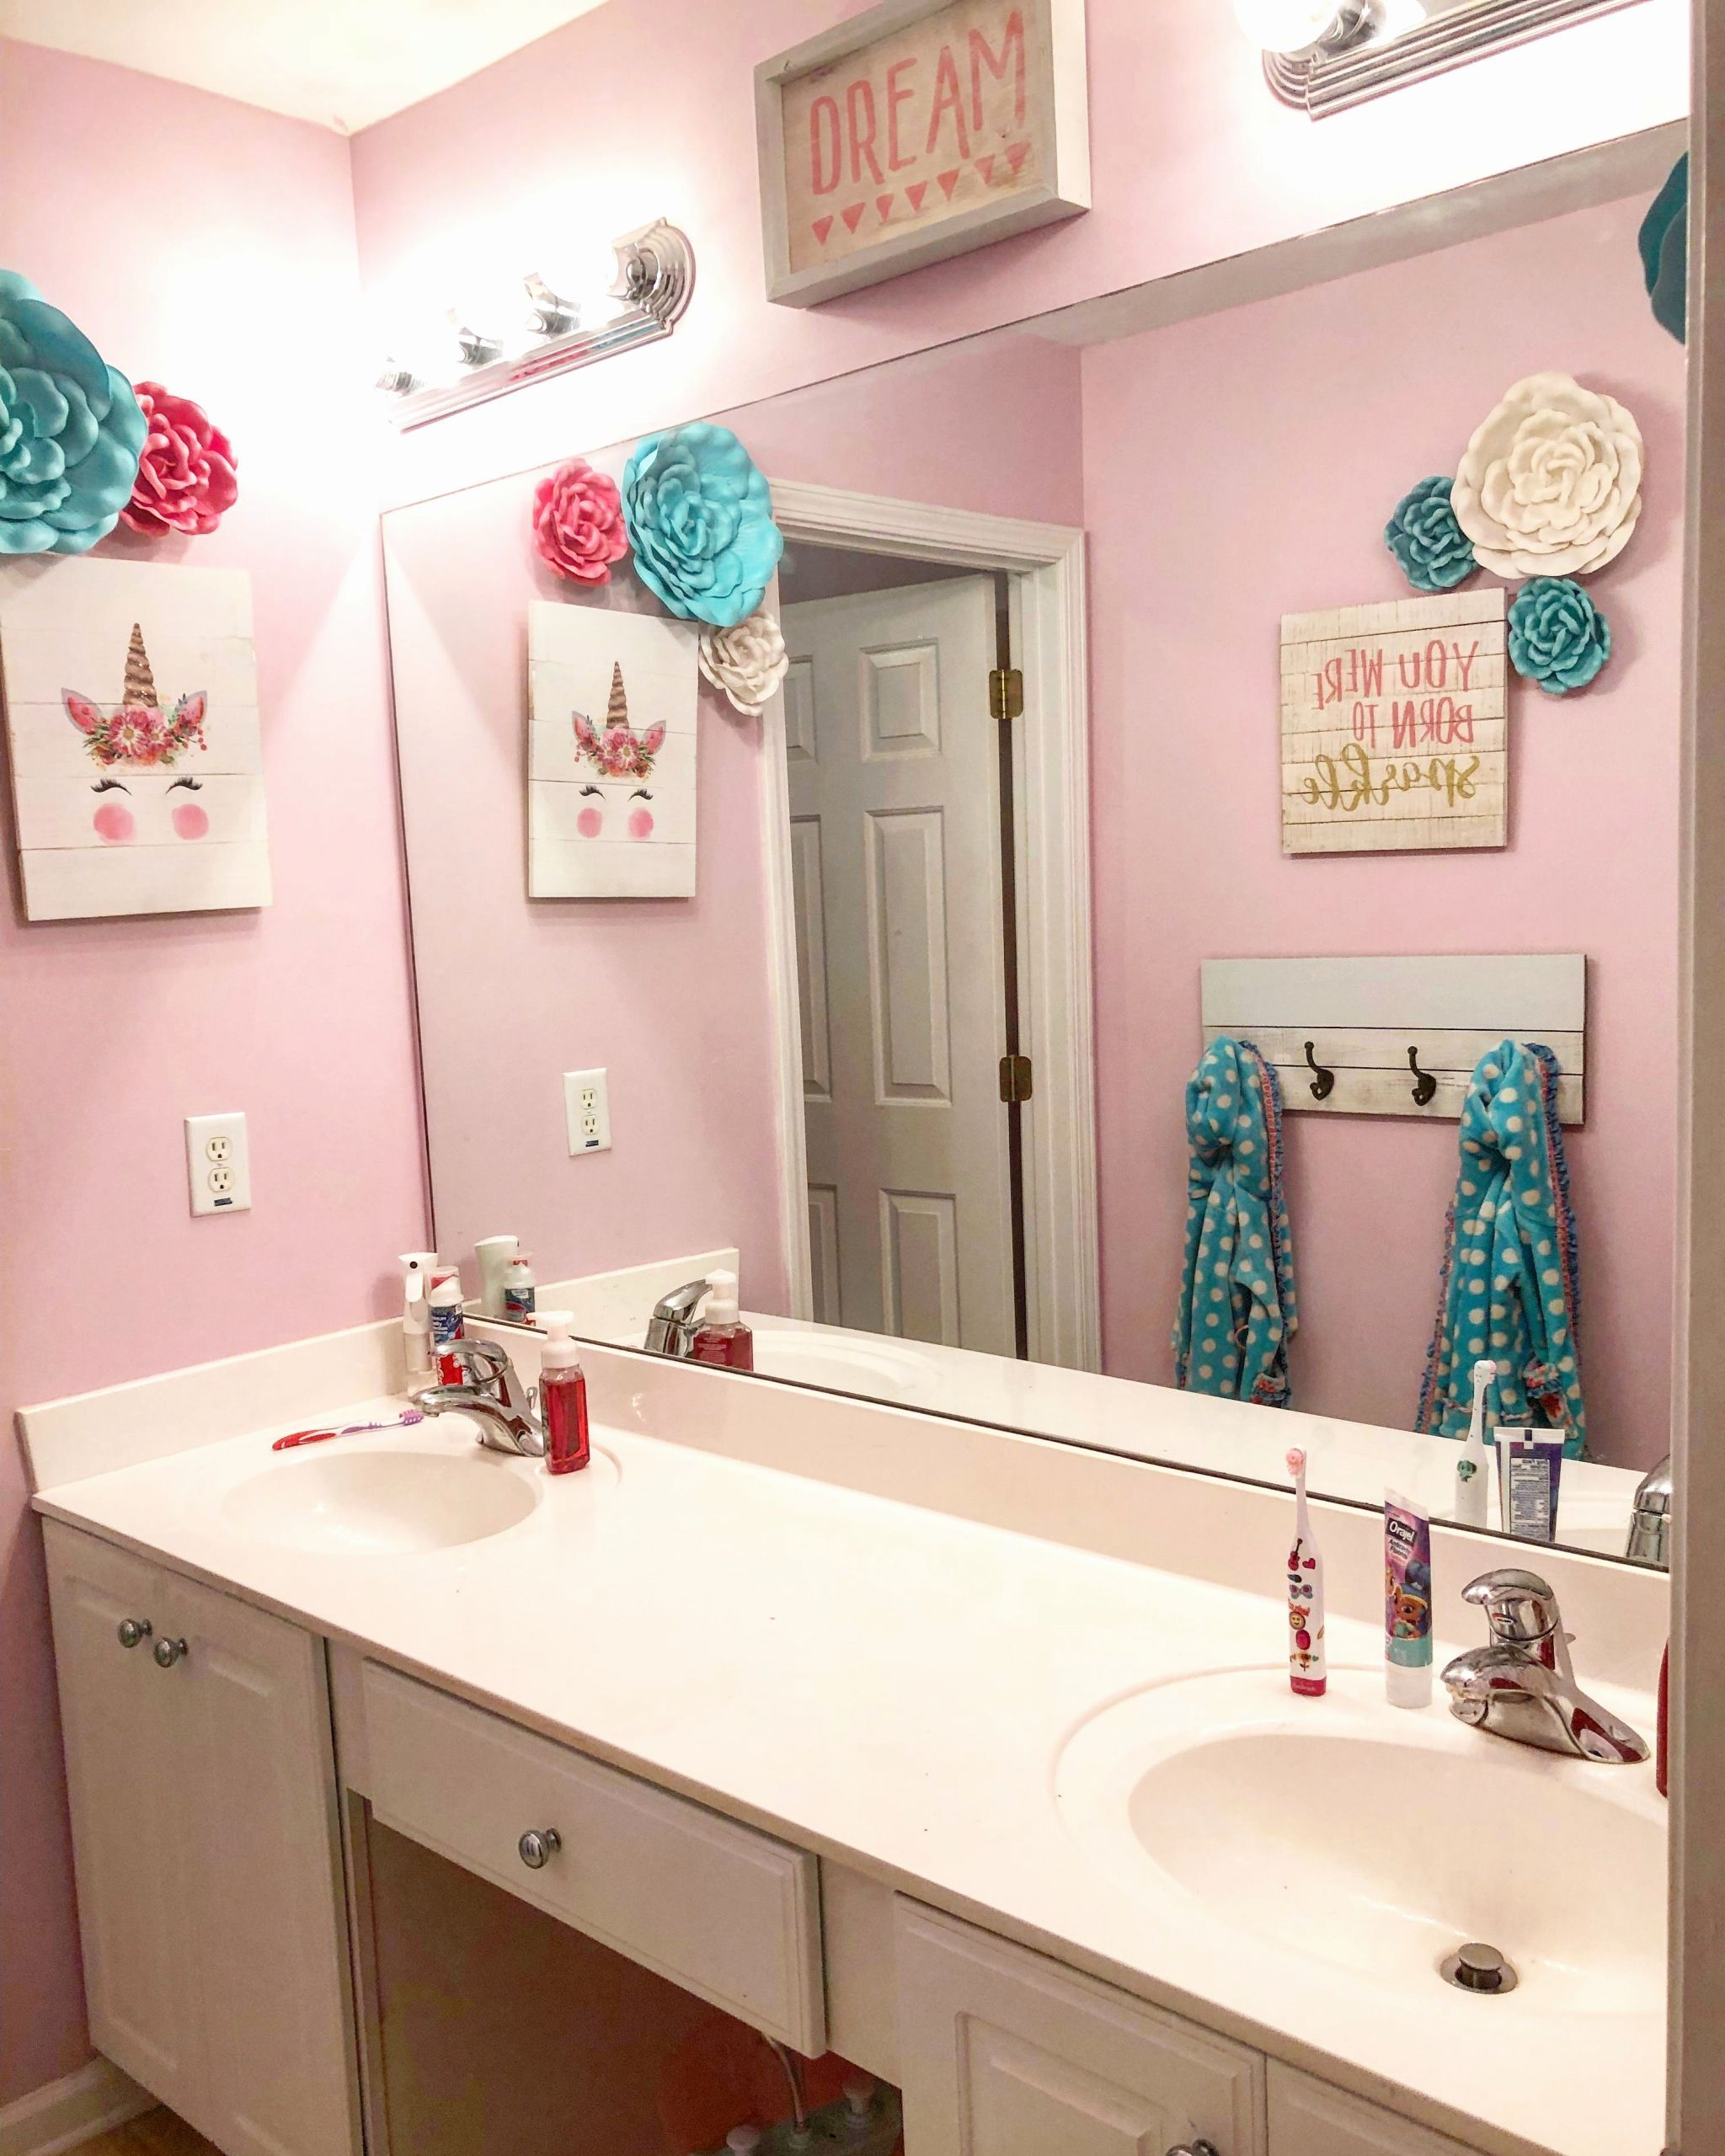 24 Girl Bathroom Decorating Ideas In 2020 Girl Bathroom Decor